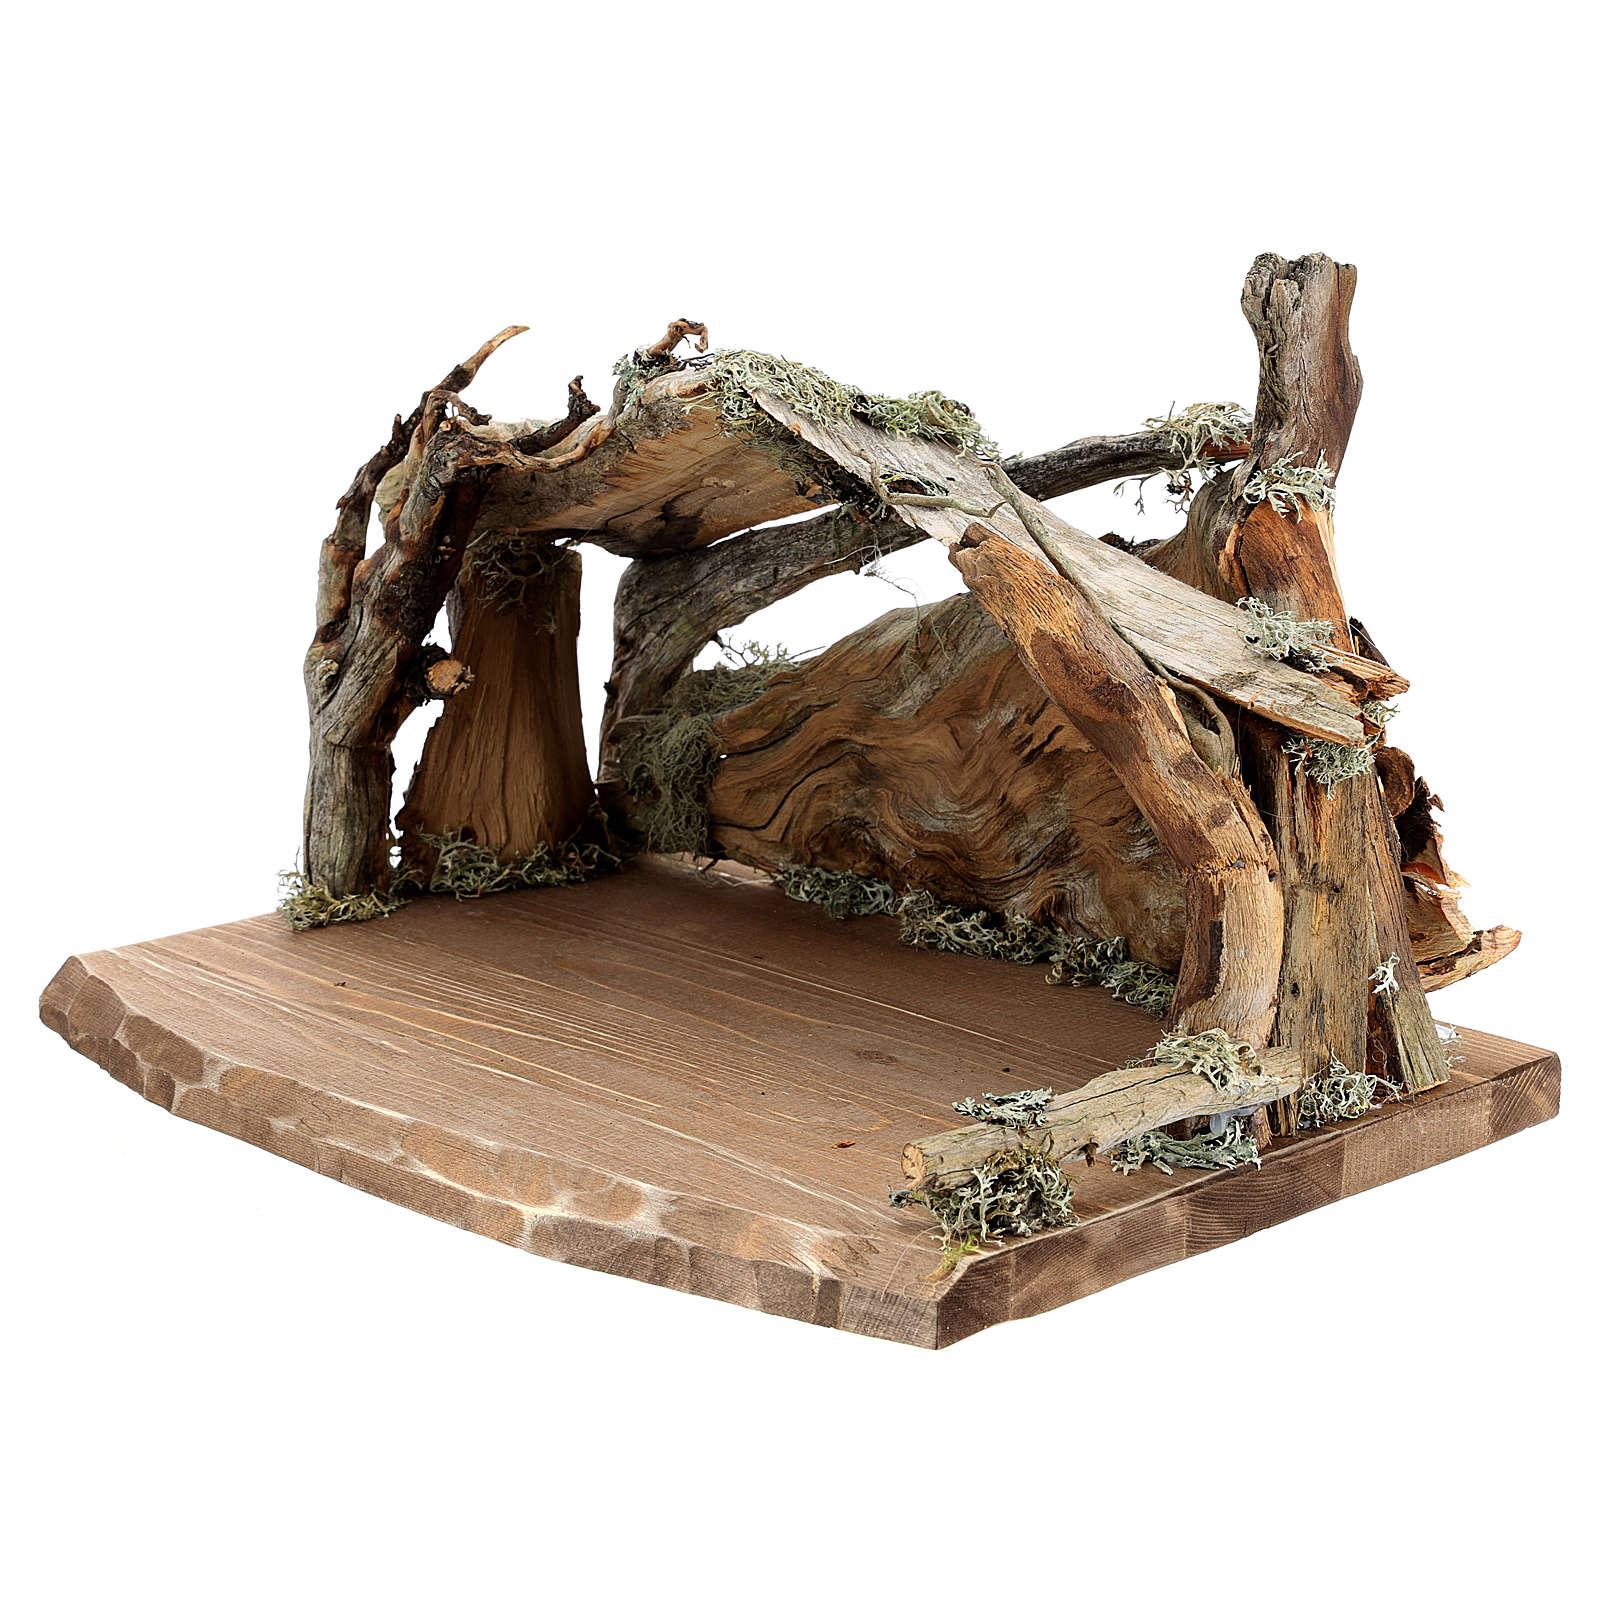 Cabaña corteza grande set 12 piezas madera pintada belén Rainell 11 cm 4